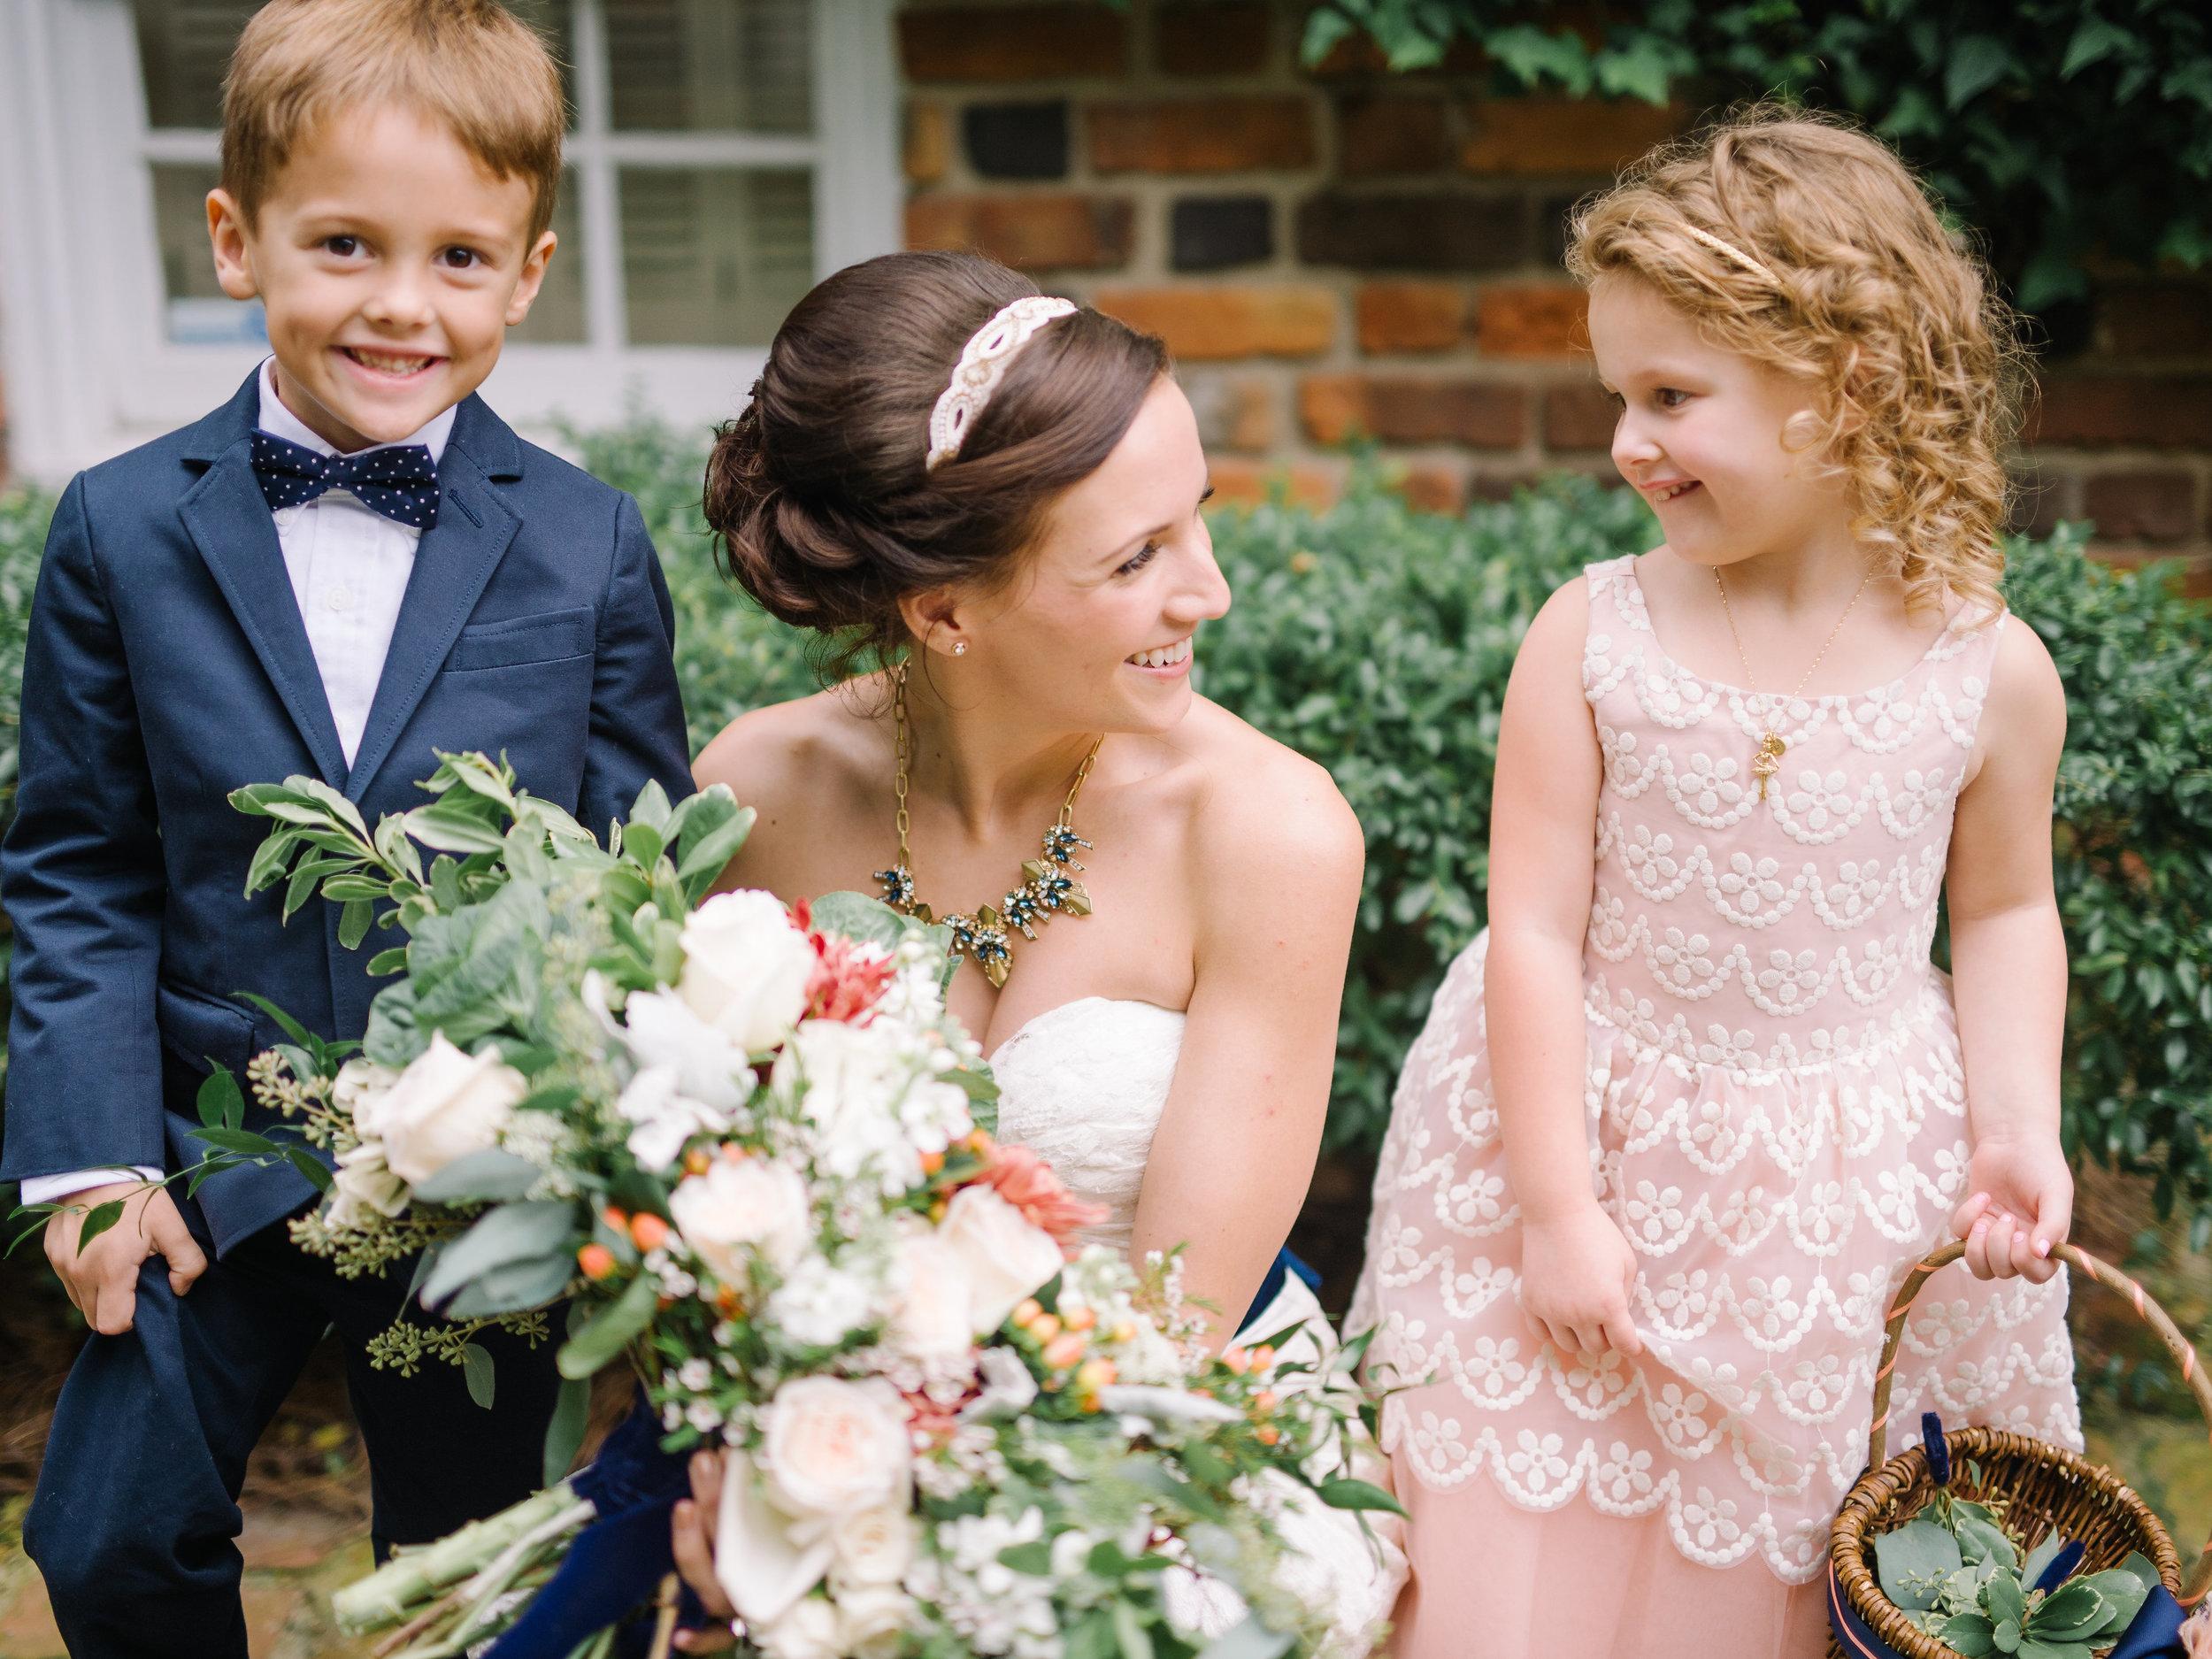 amber-and-paul-rach-loves-troy-charles-h-morris-center-wedding-sarah-seven-helene-lace-wedding-dress-ivory-and-beau-bridal-boutique-savannah-wedding-planner-savannah-event-designer-savannah-florist-savannah-weddings-savannah-bridal-boutique-19.jpg